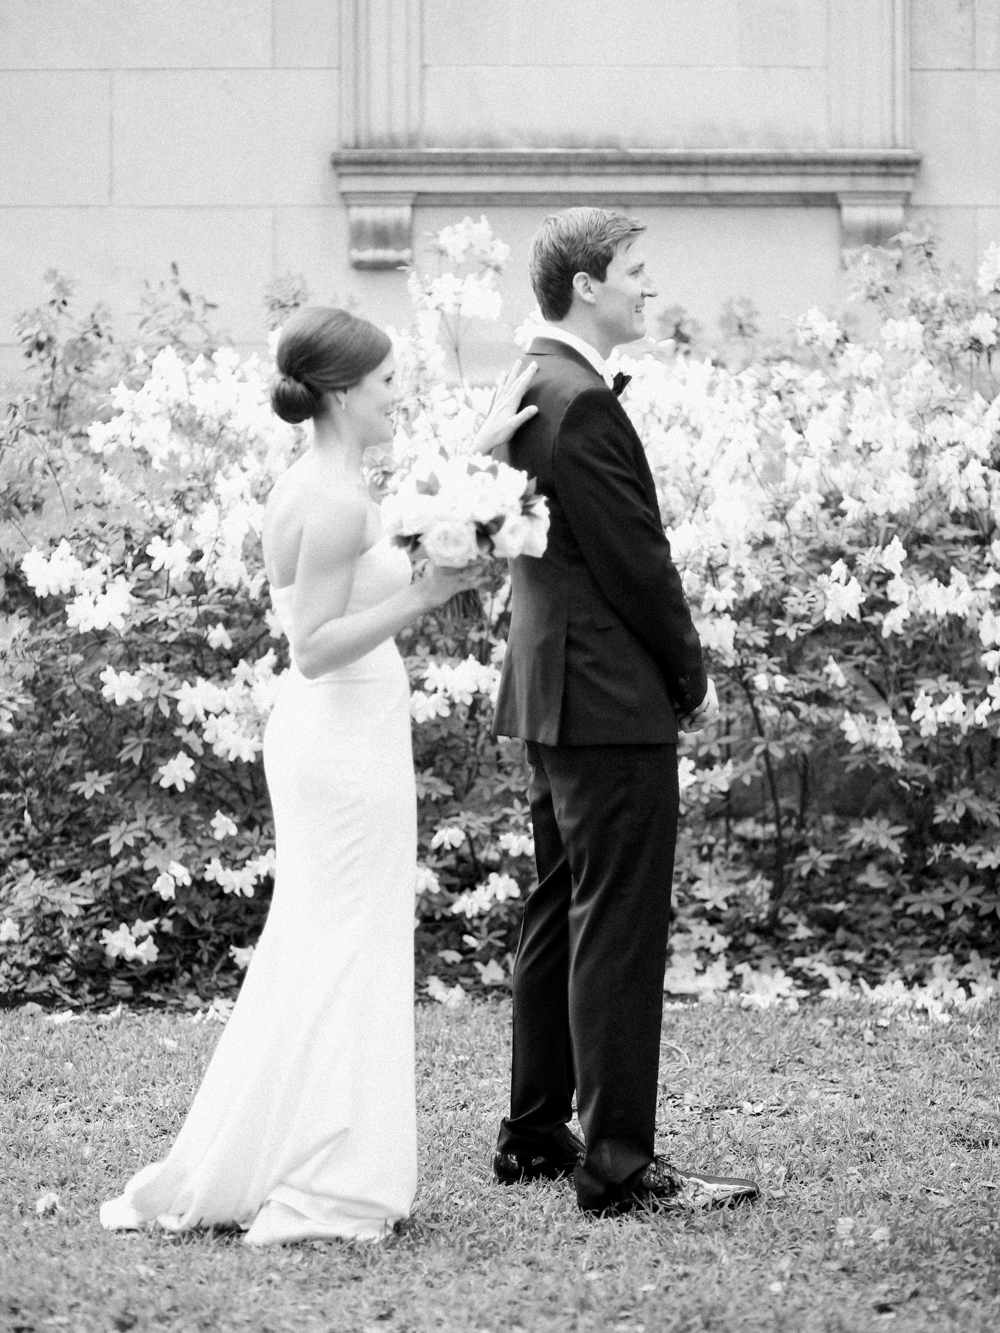 benefits of a first look_wedding photography_wedding photographer_film wedding photographer_Christine Gosch_www.christinegosch.com_Houston, Texas wedding photographer_ Houston, Texas-3.jpg